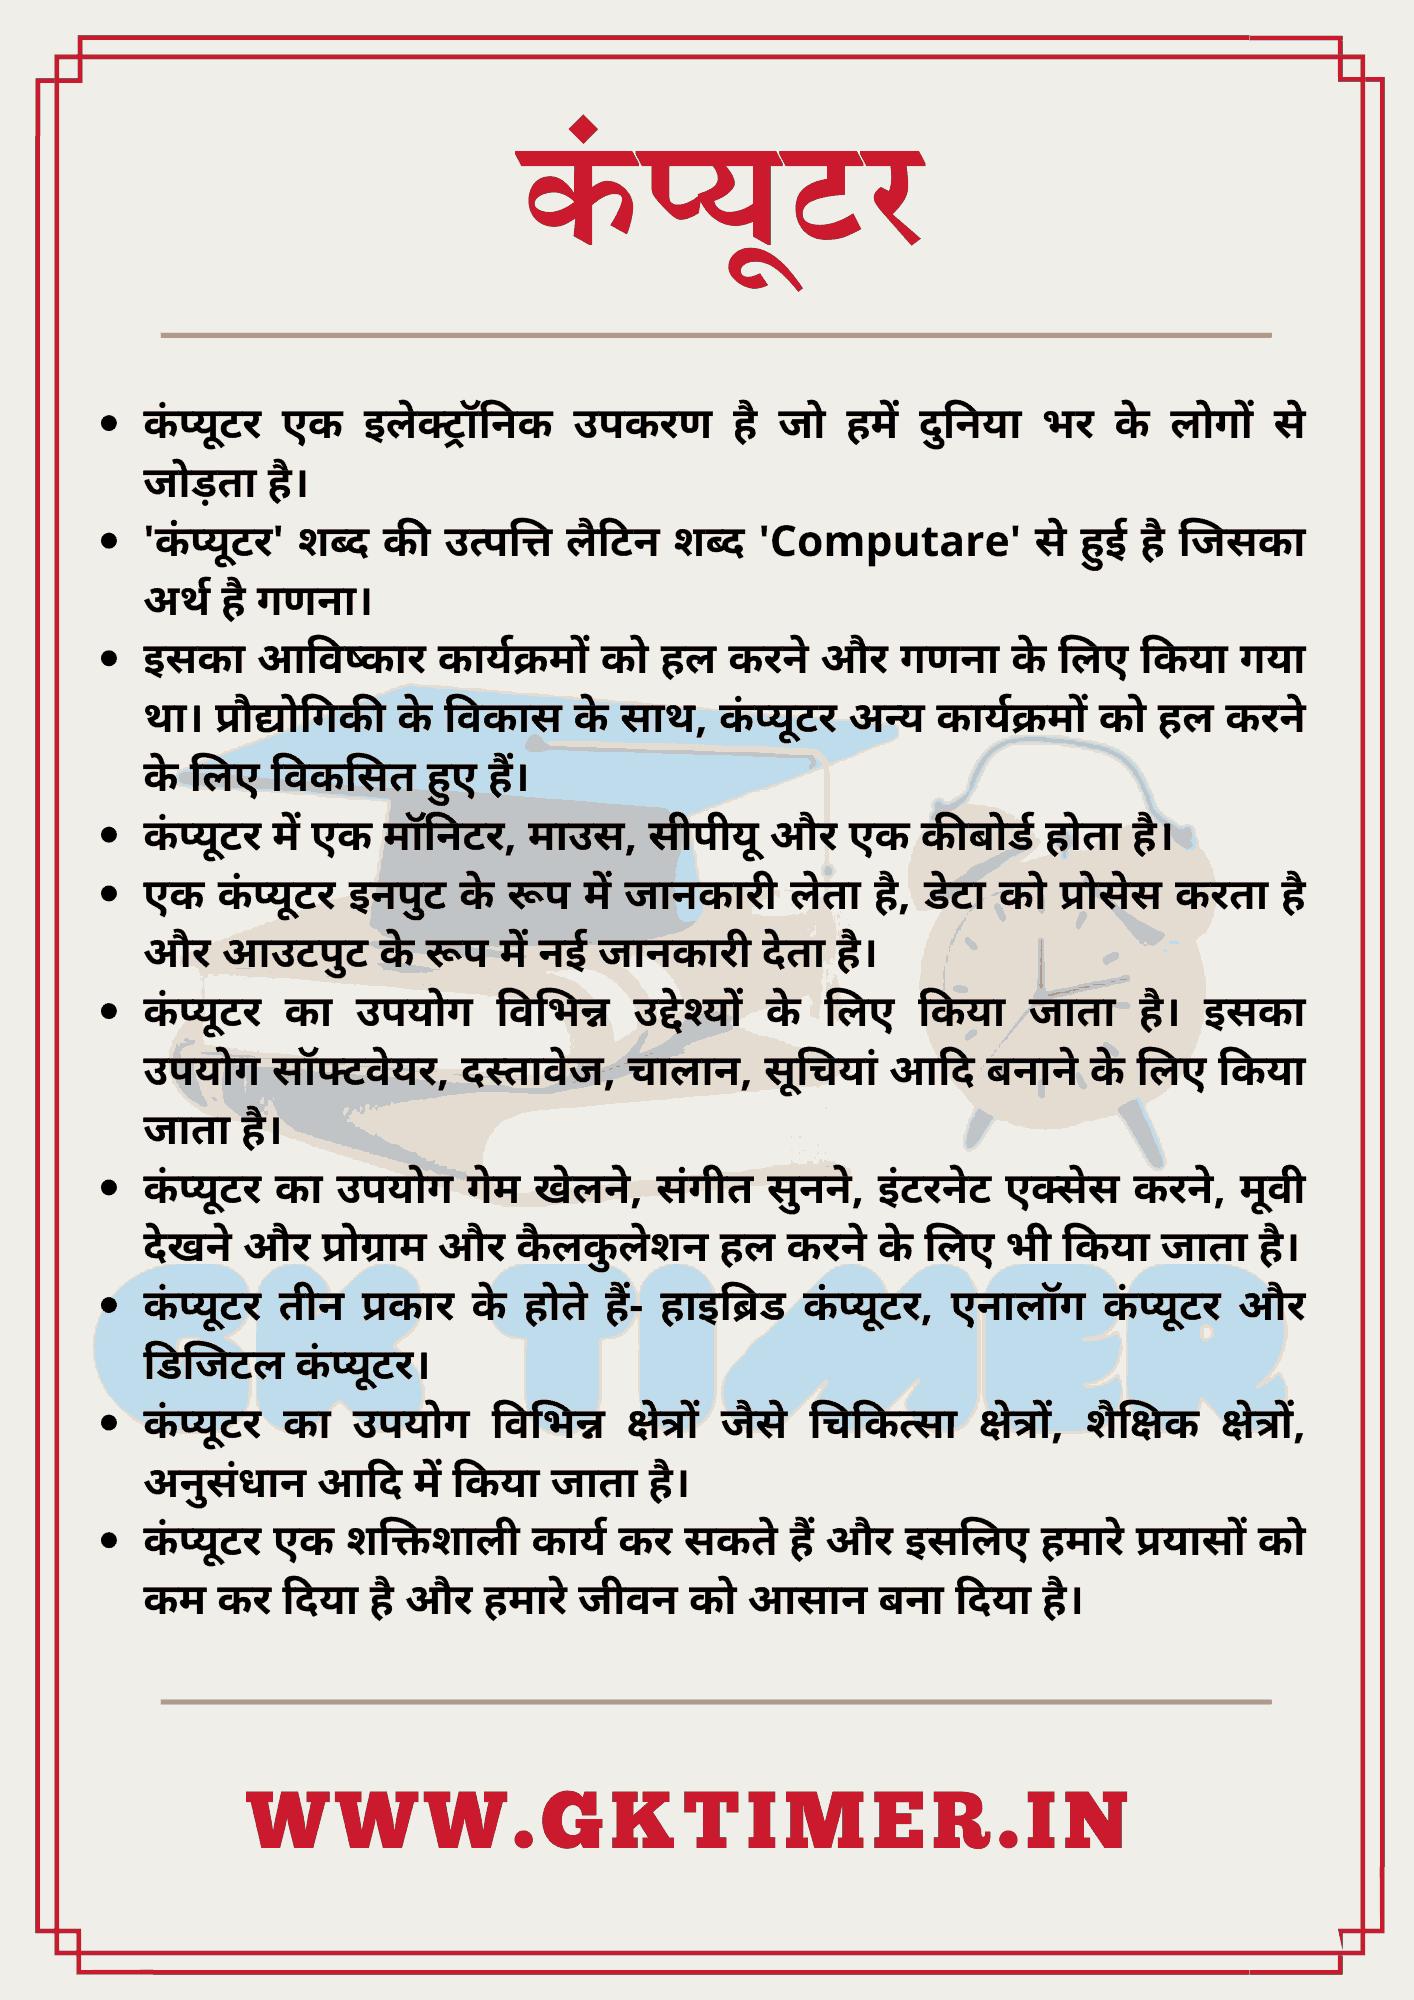 कंप्यूटर पर निबंध   Essay on Computer in Hindi   10 Lines on Computer in Hindi